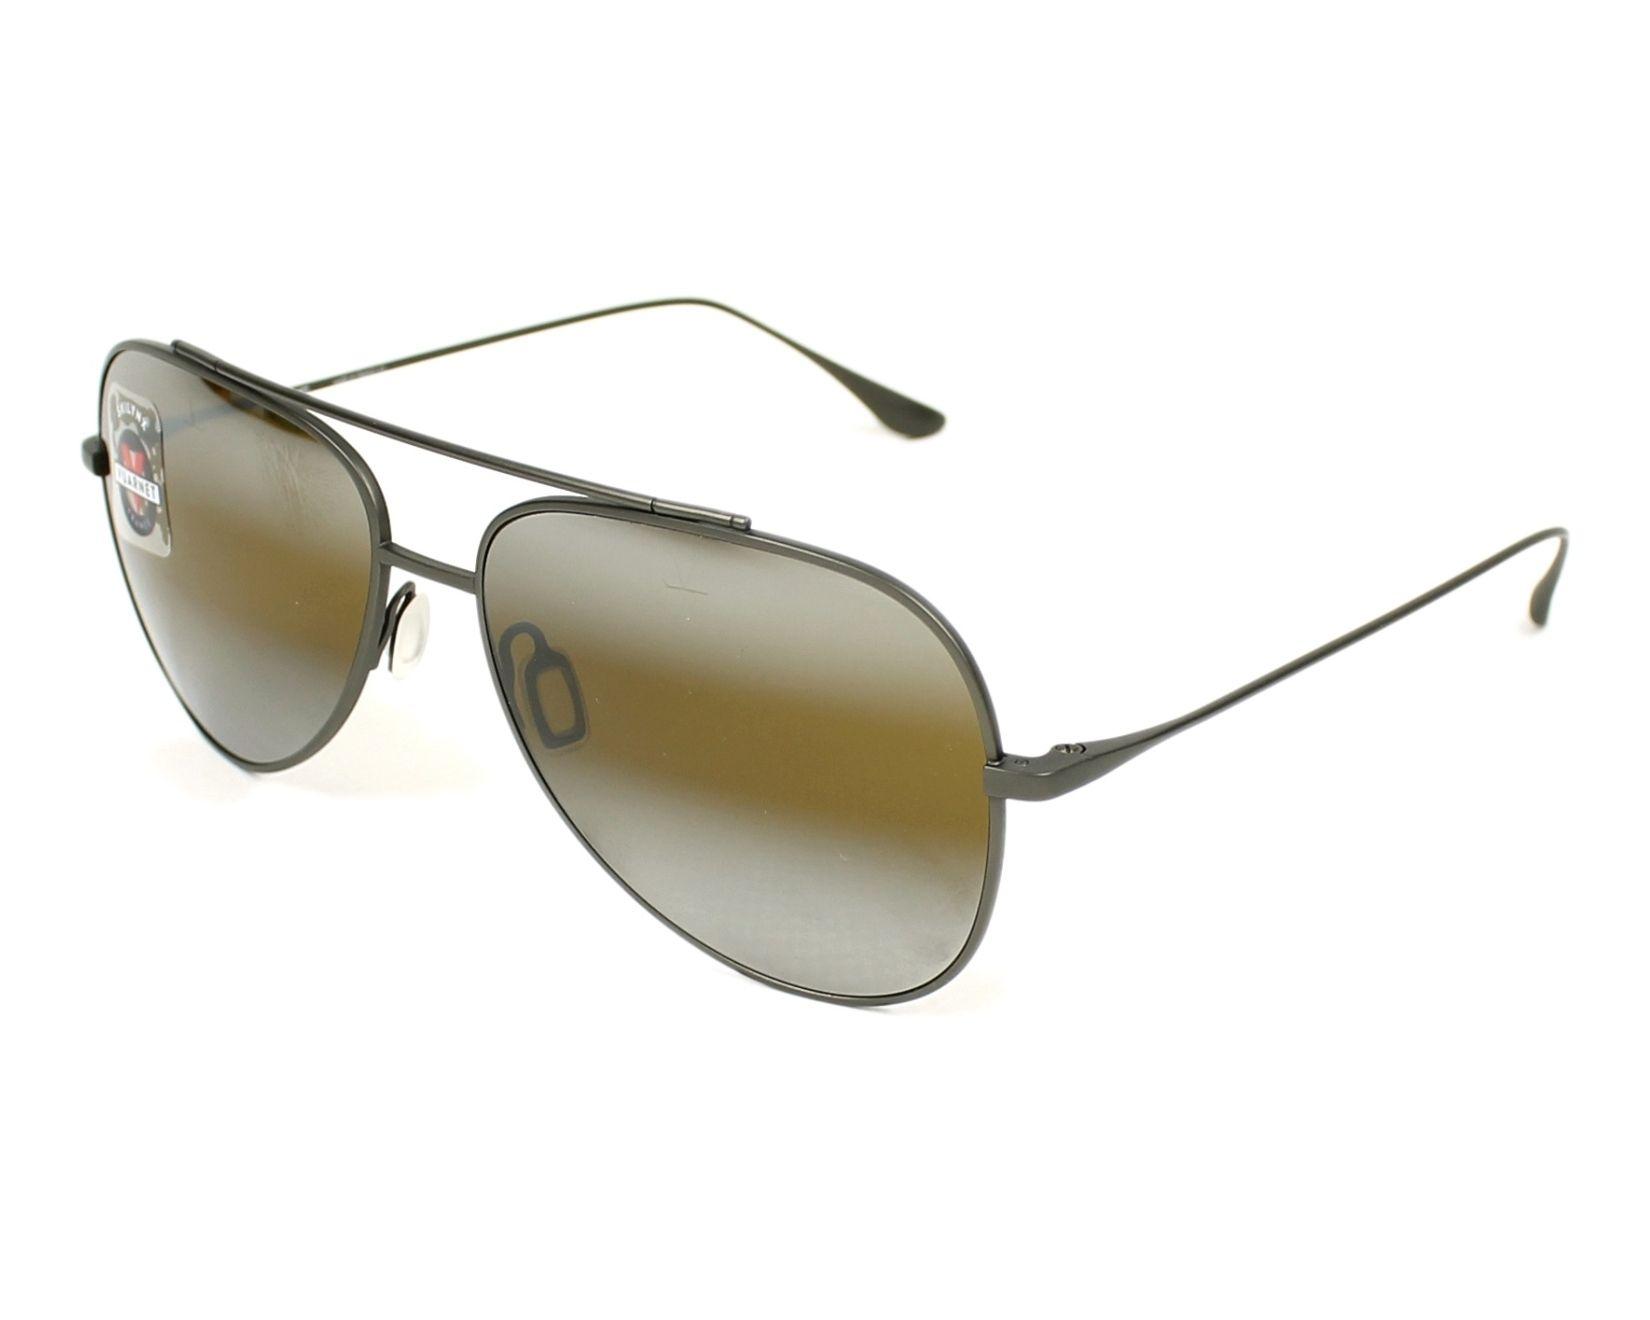 c374c0369fe4 Sunglasses Vuarnet Swing Pilote Large VL-1611 - 0003-7184